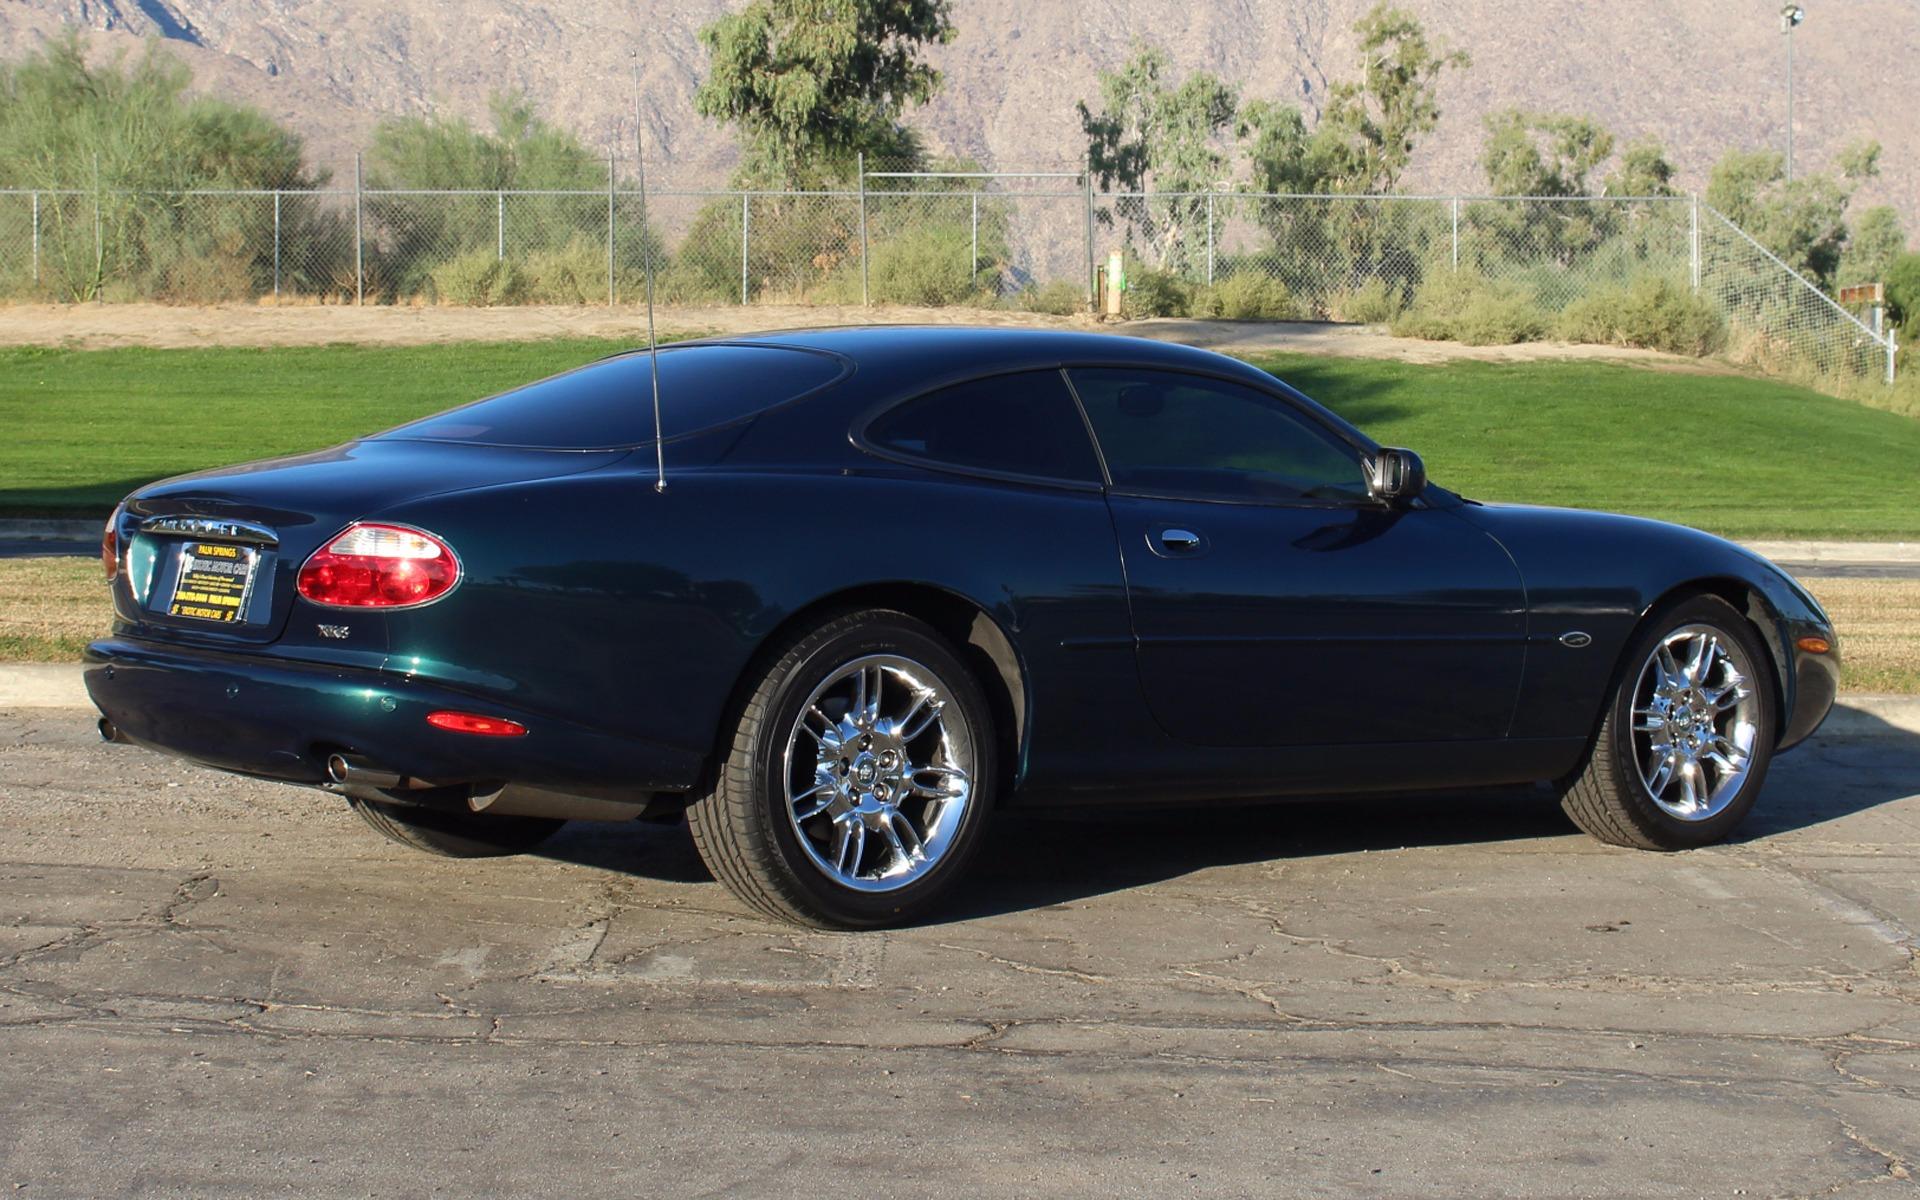 2002 Jaguar Xk Series Xk8 Stock Jo237 For Sale Near Palm